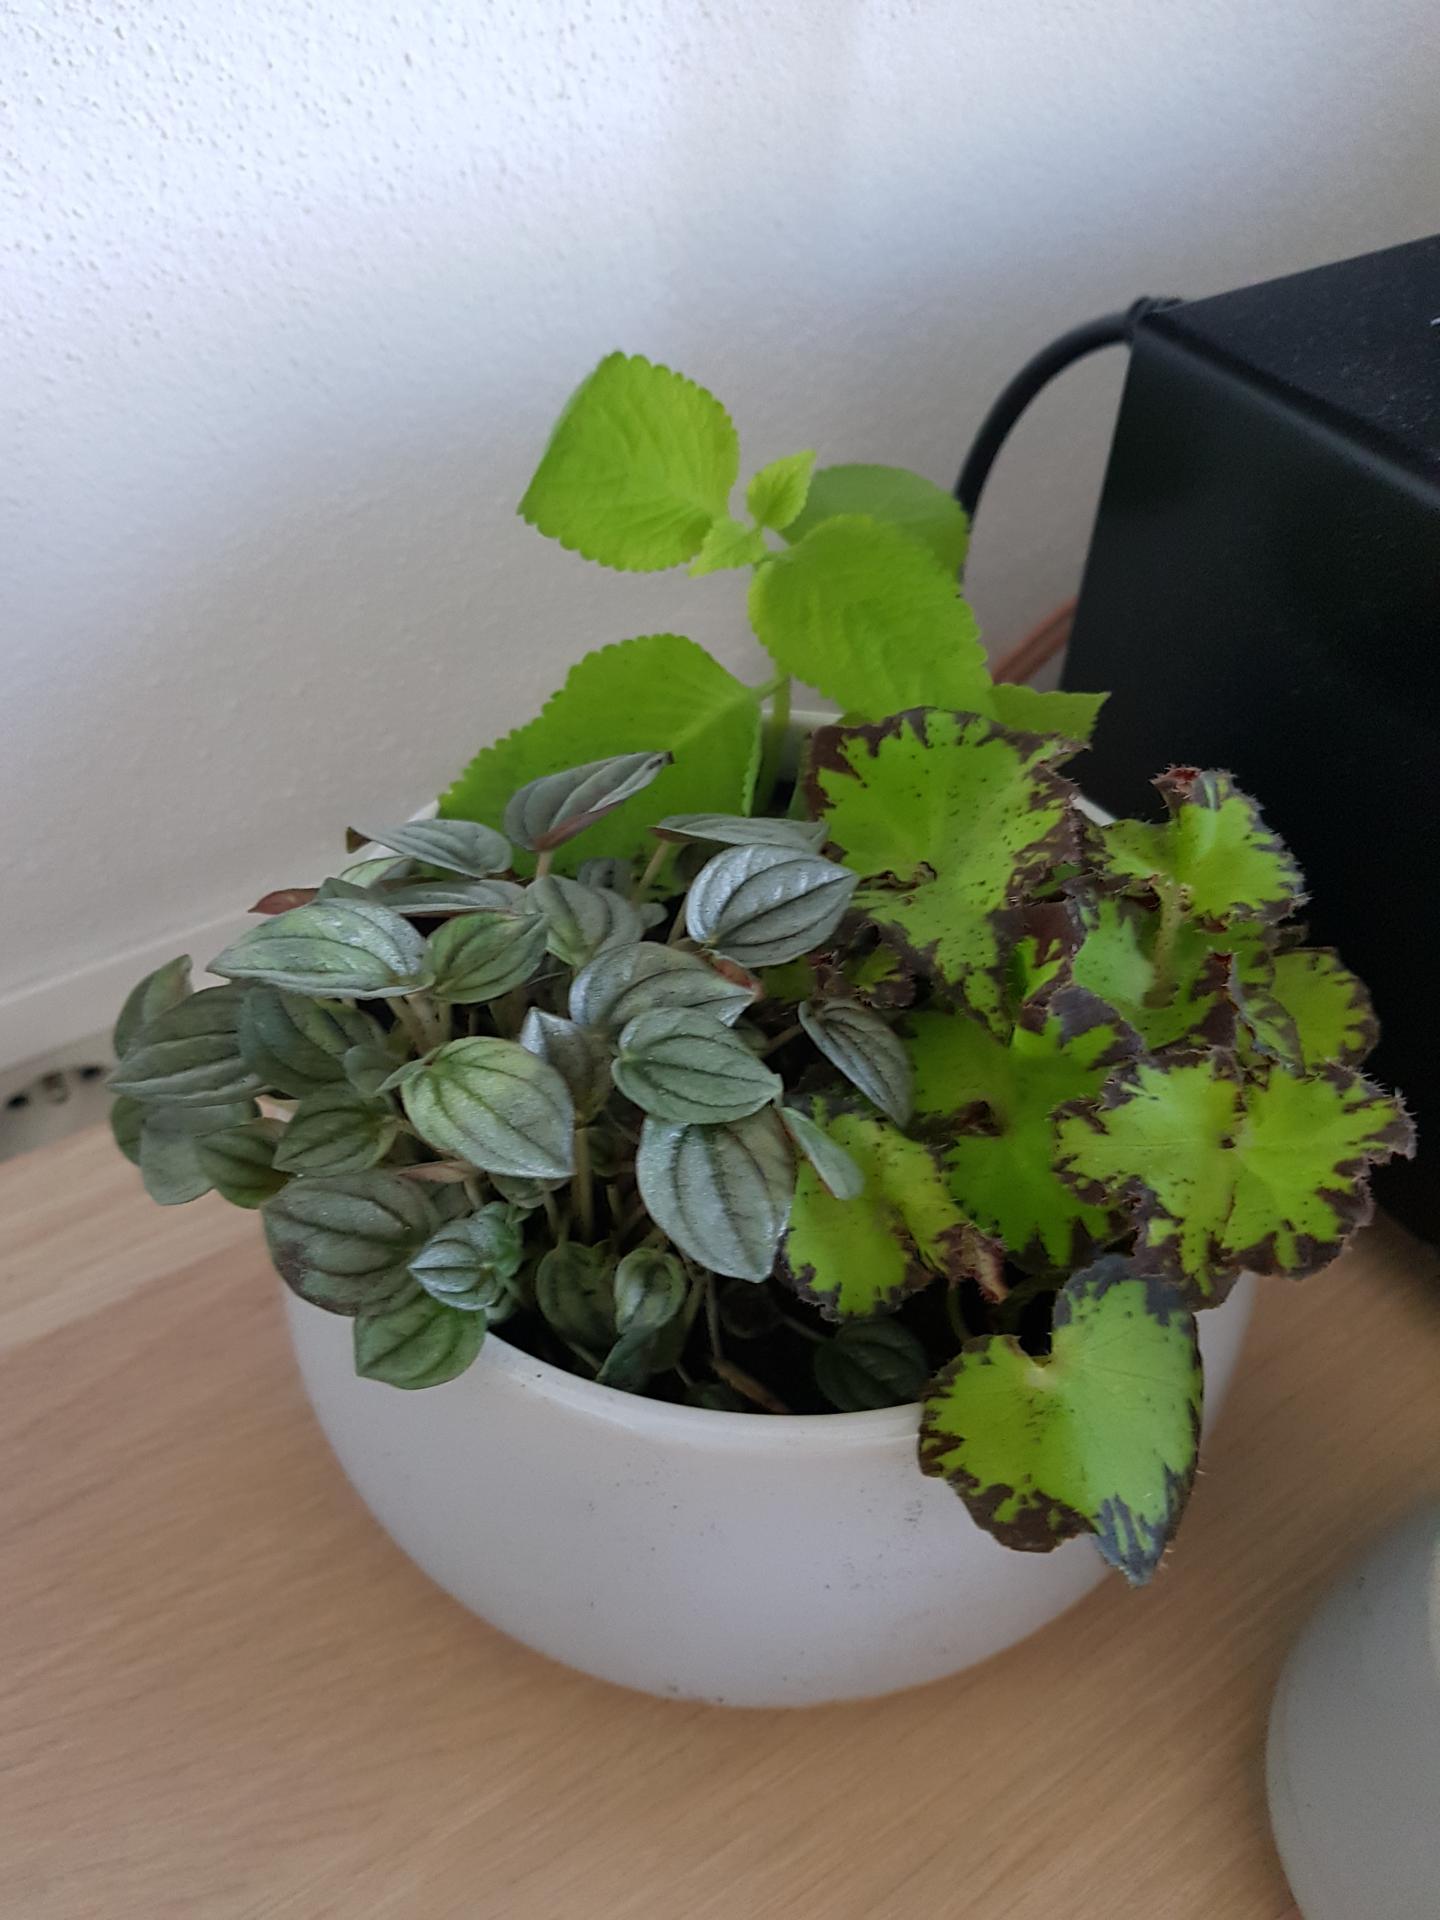 Moje krásne kvetinky - peperomia caperata, begonia a koleus 4/2020